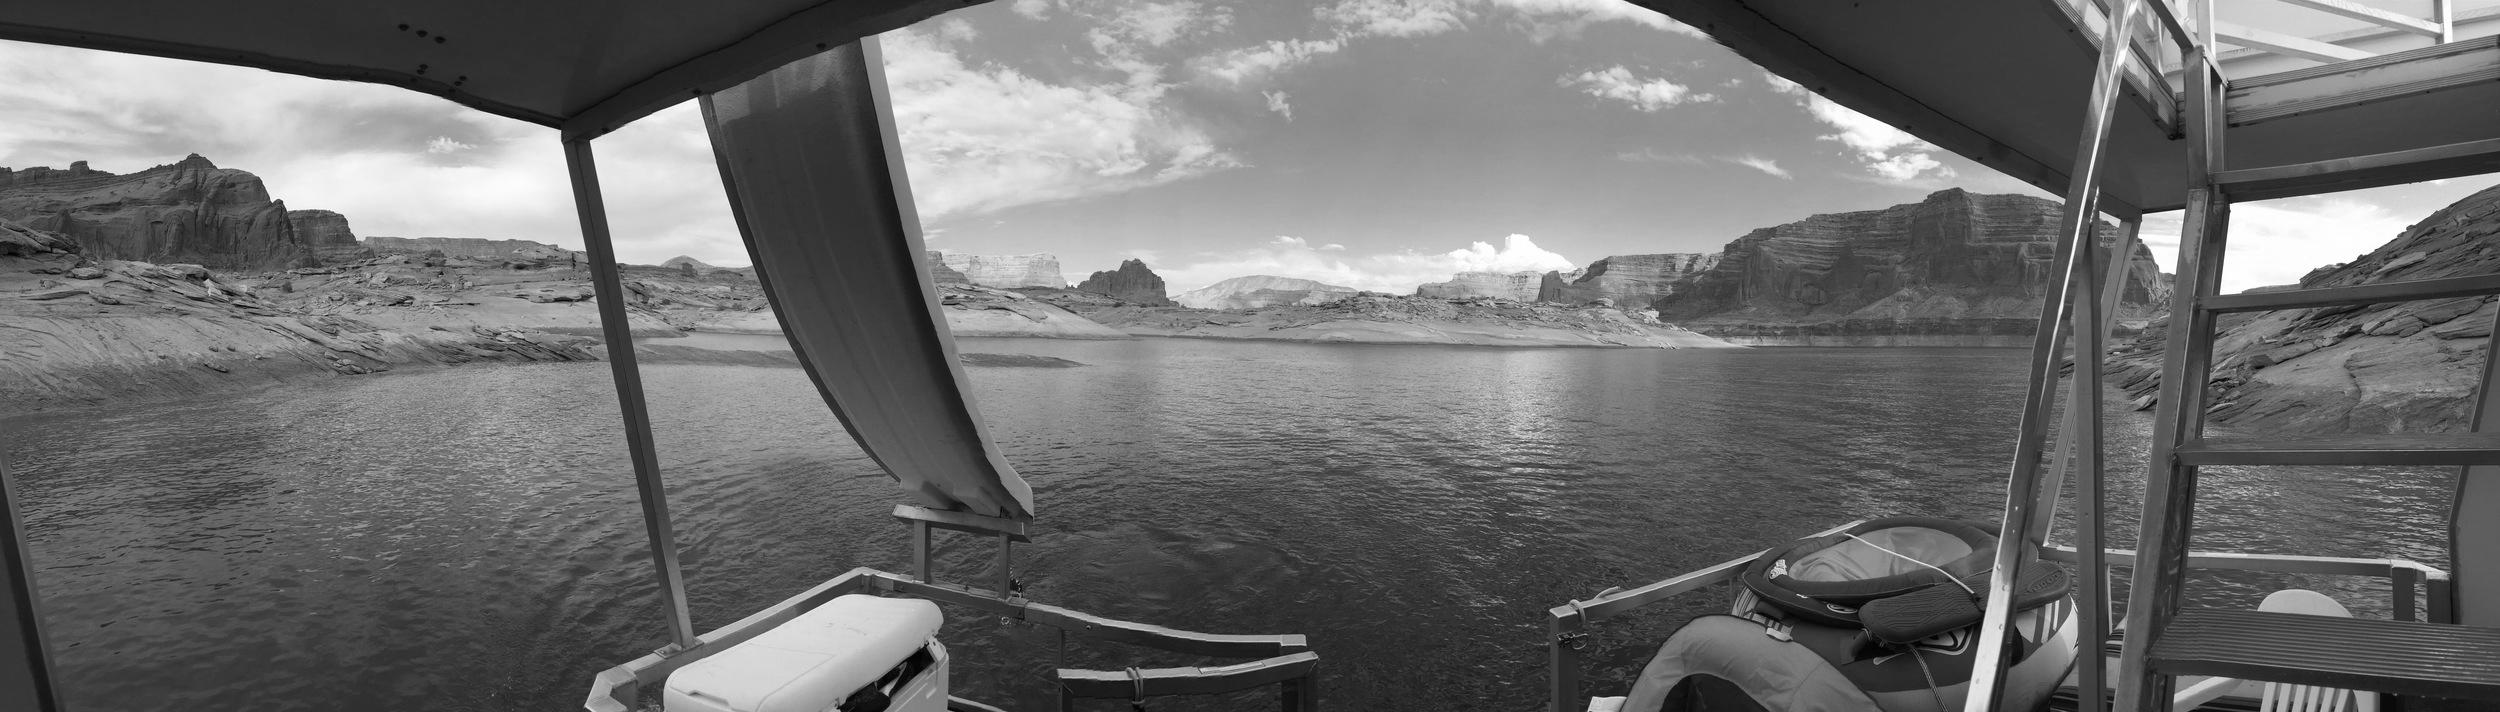 Lake Powell Paradise